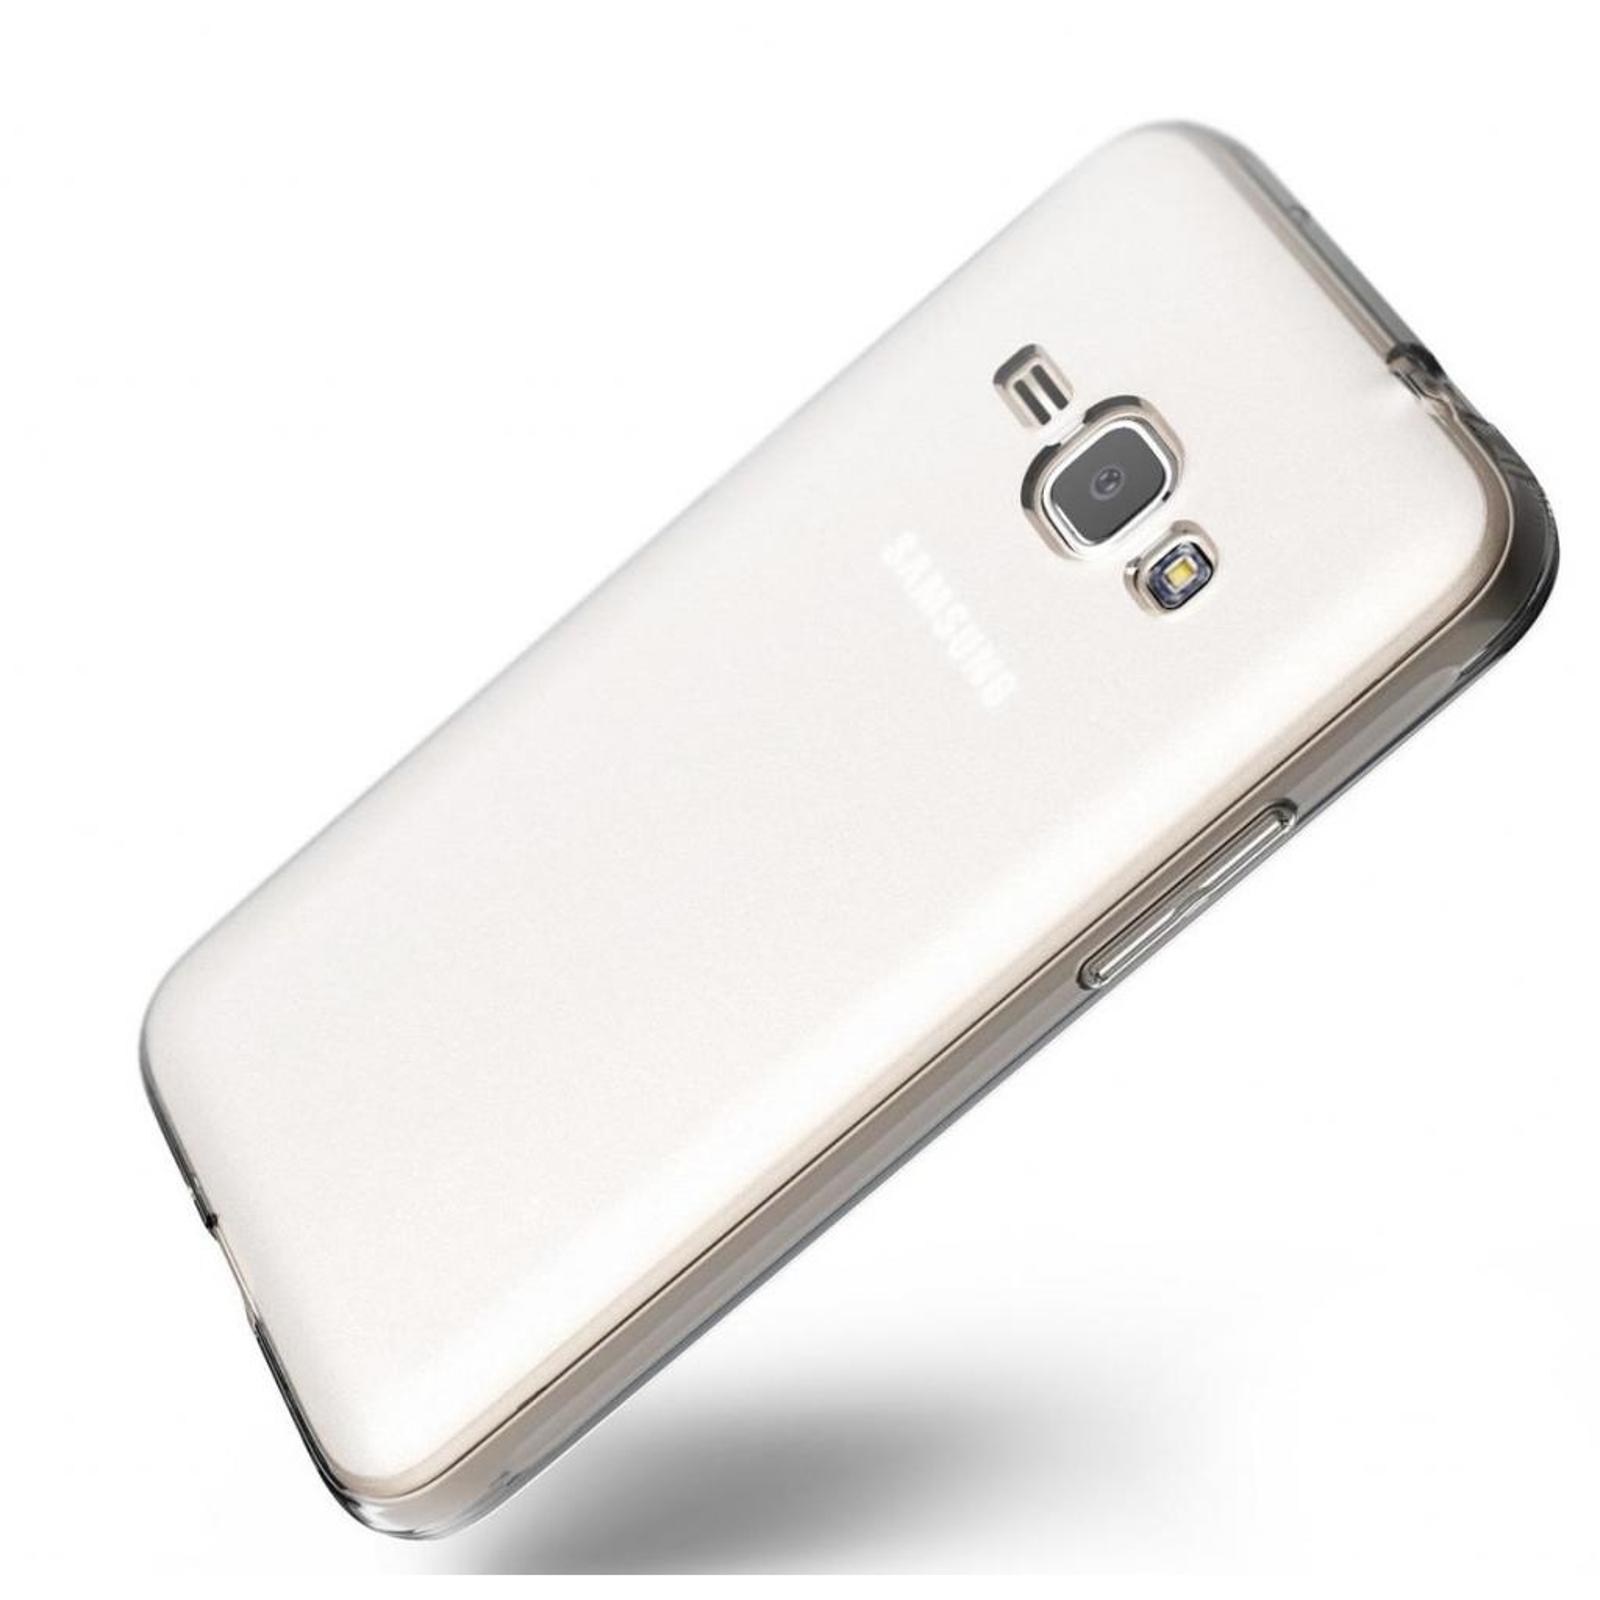 Чехол для моб. телефона SmartCase Samsung Galaxy J3 /J320 TPU Clear (SC-J320) изображение 3